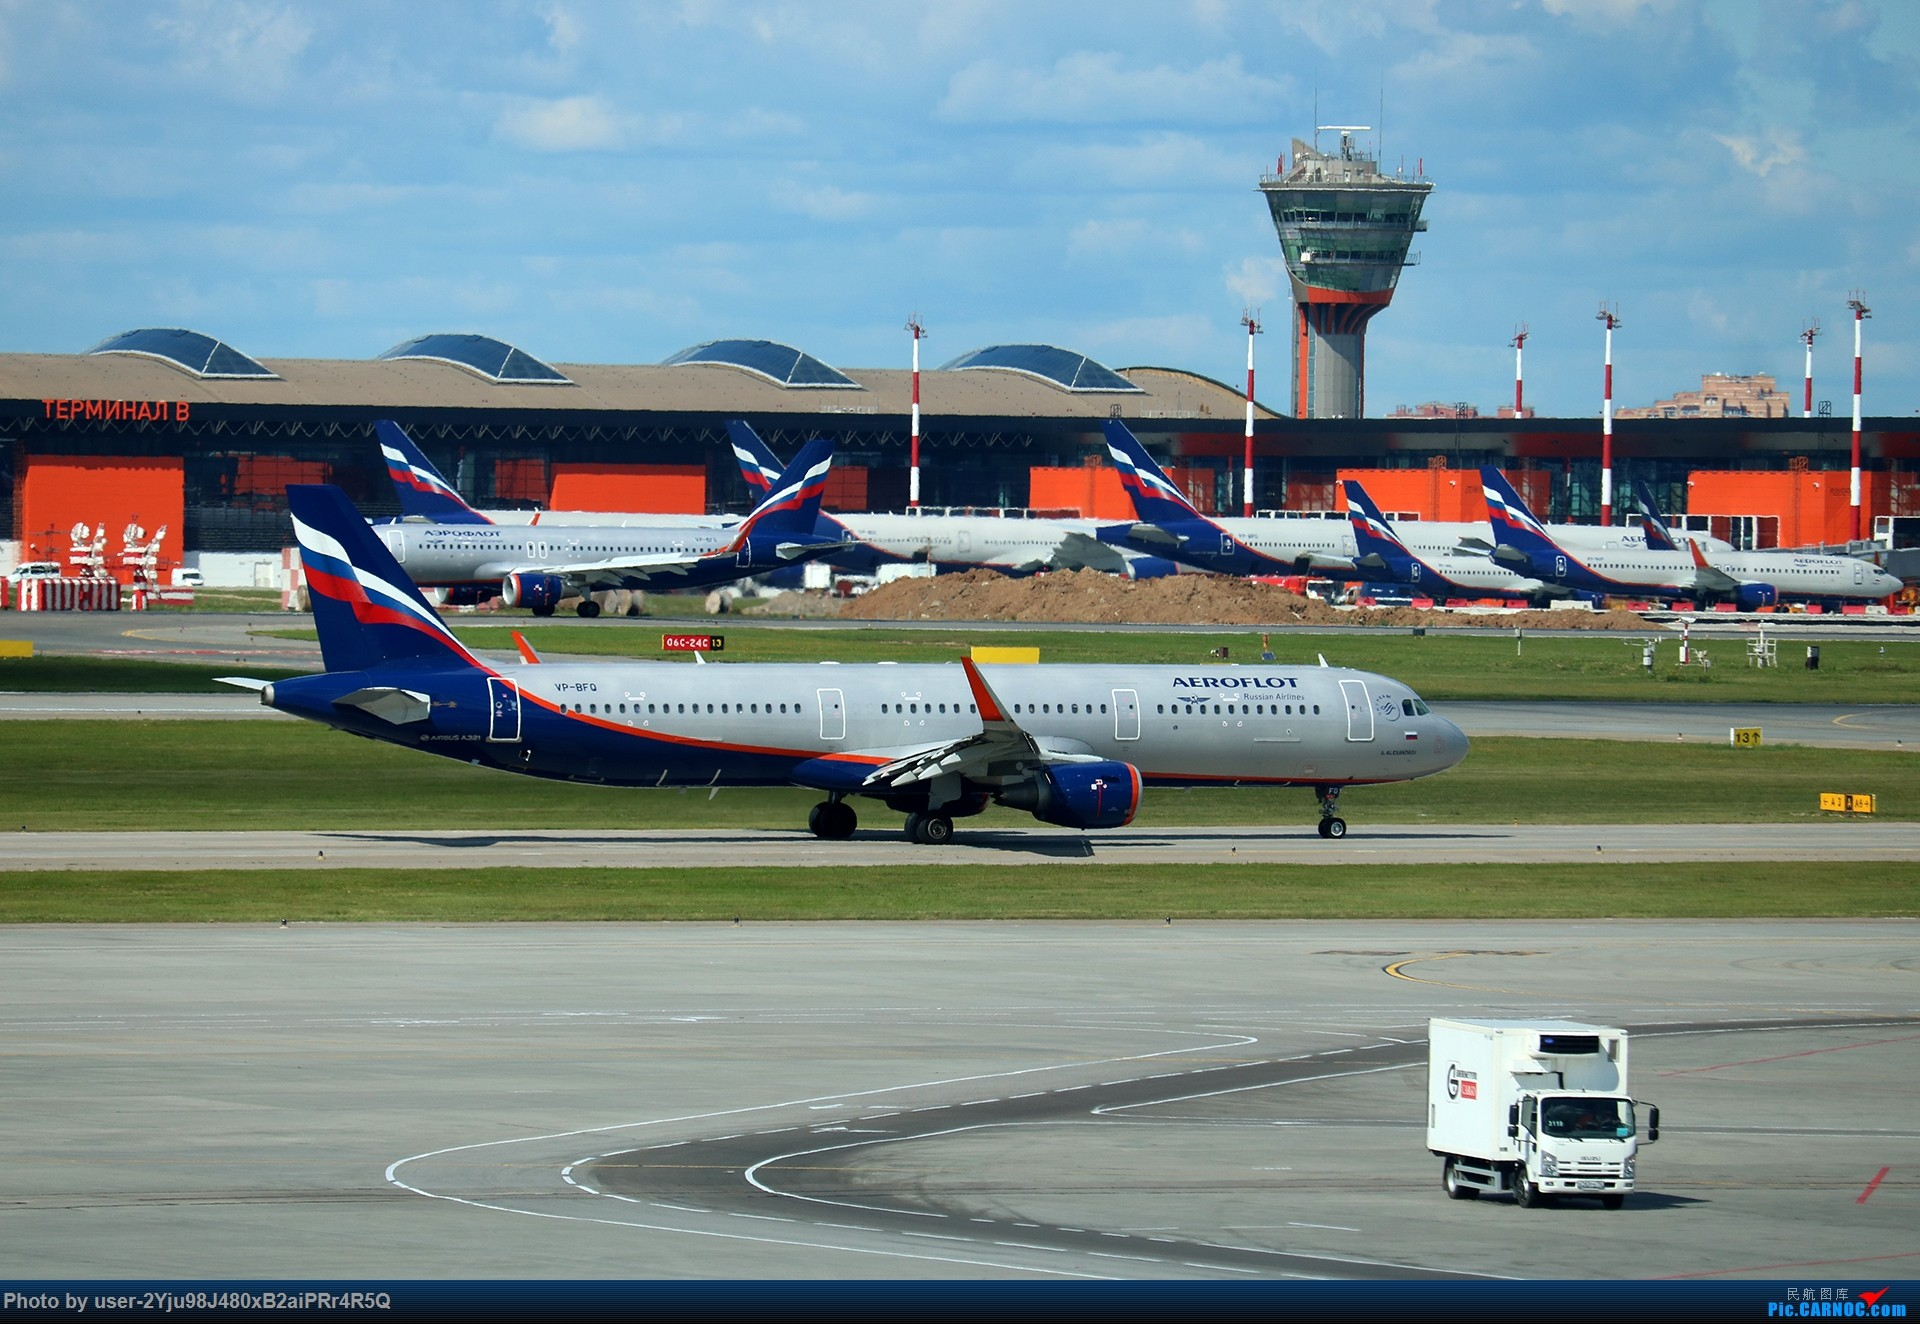 Re:[原创]LIULIU Sheremetyevo的漫游 Aeroflot毛航篇 AIRBUS A321-211(SL) VP-BFQ 俄罗斯谢诺梅杰沃机场